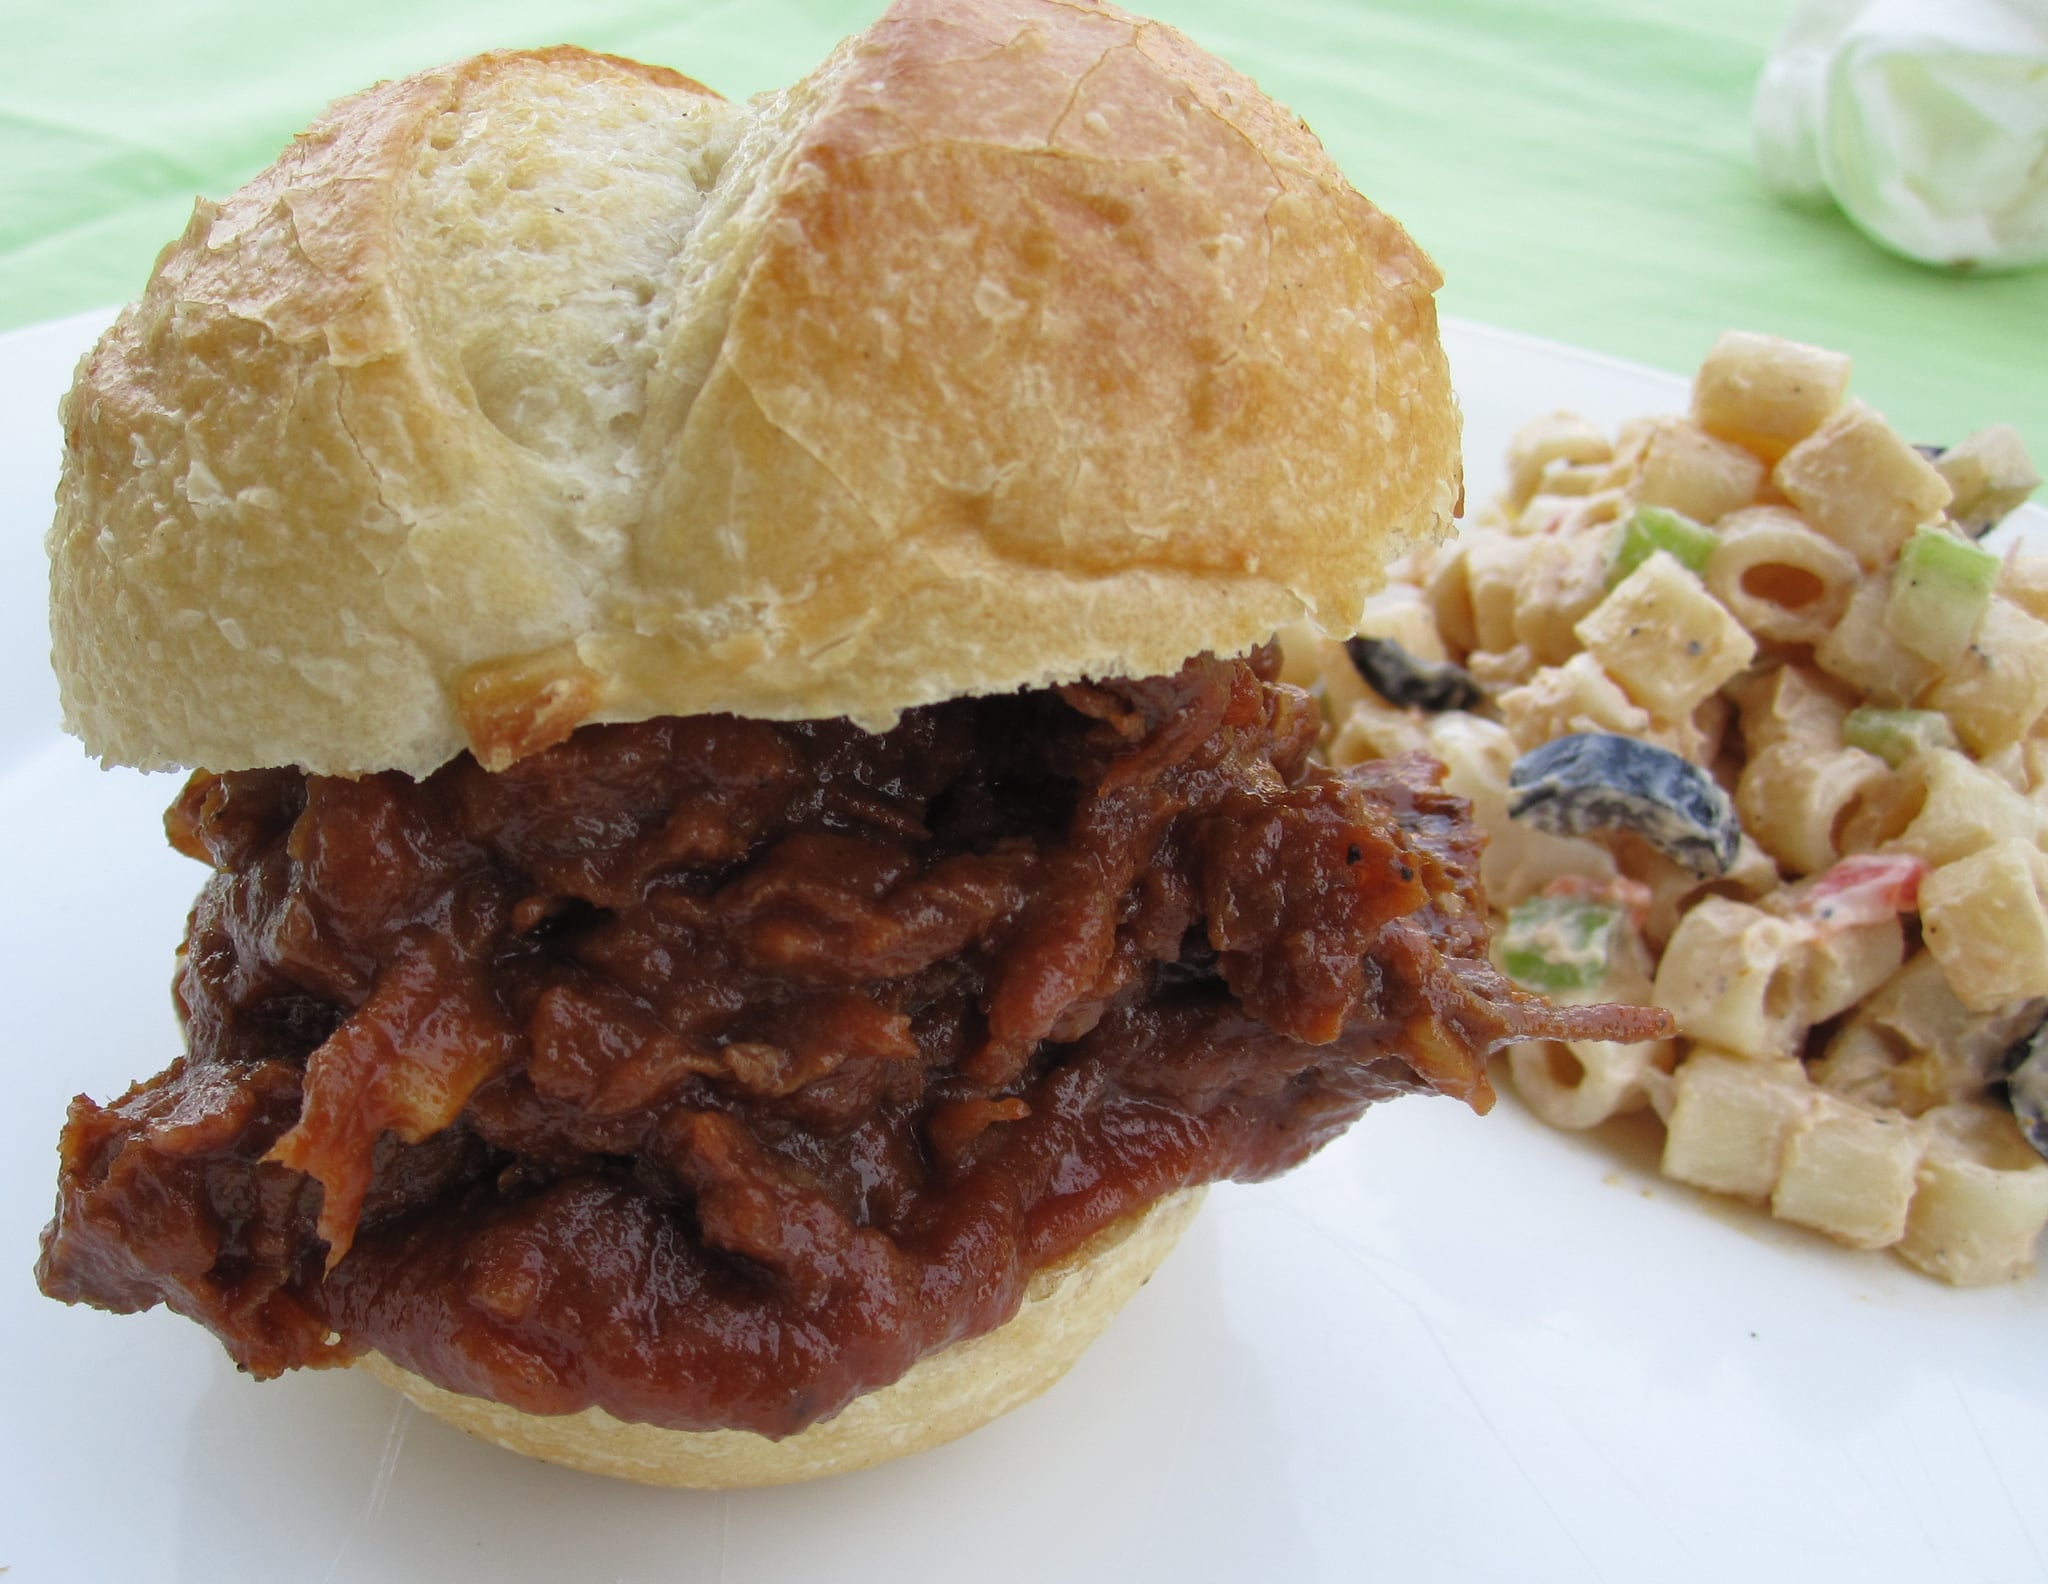 Barbecued Brisket Sandwich